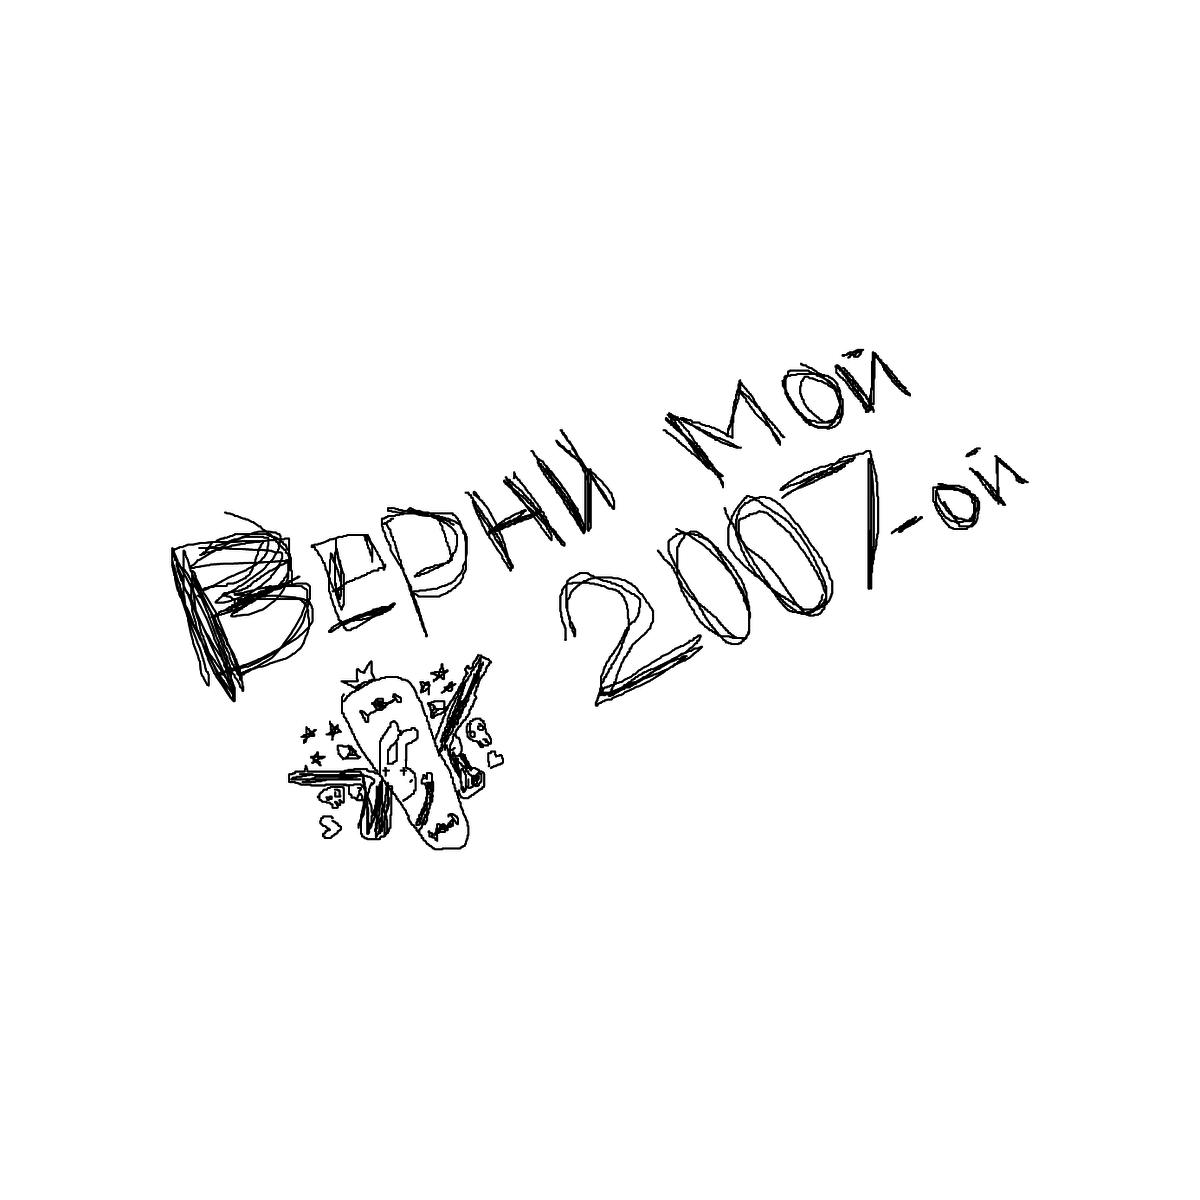 BAAAM drawing#12083 lat:55.7383003234863300lng: 52.4173202514648440